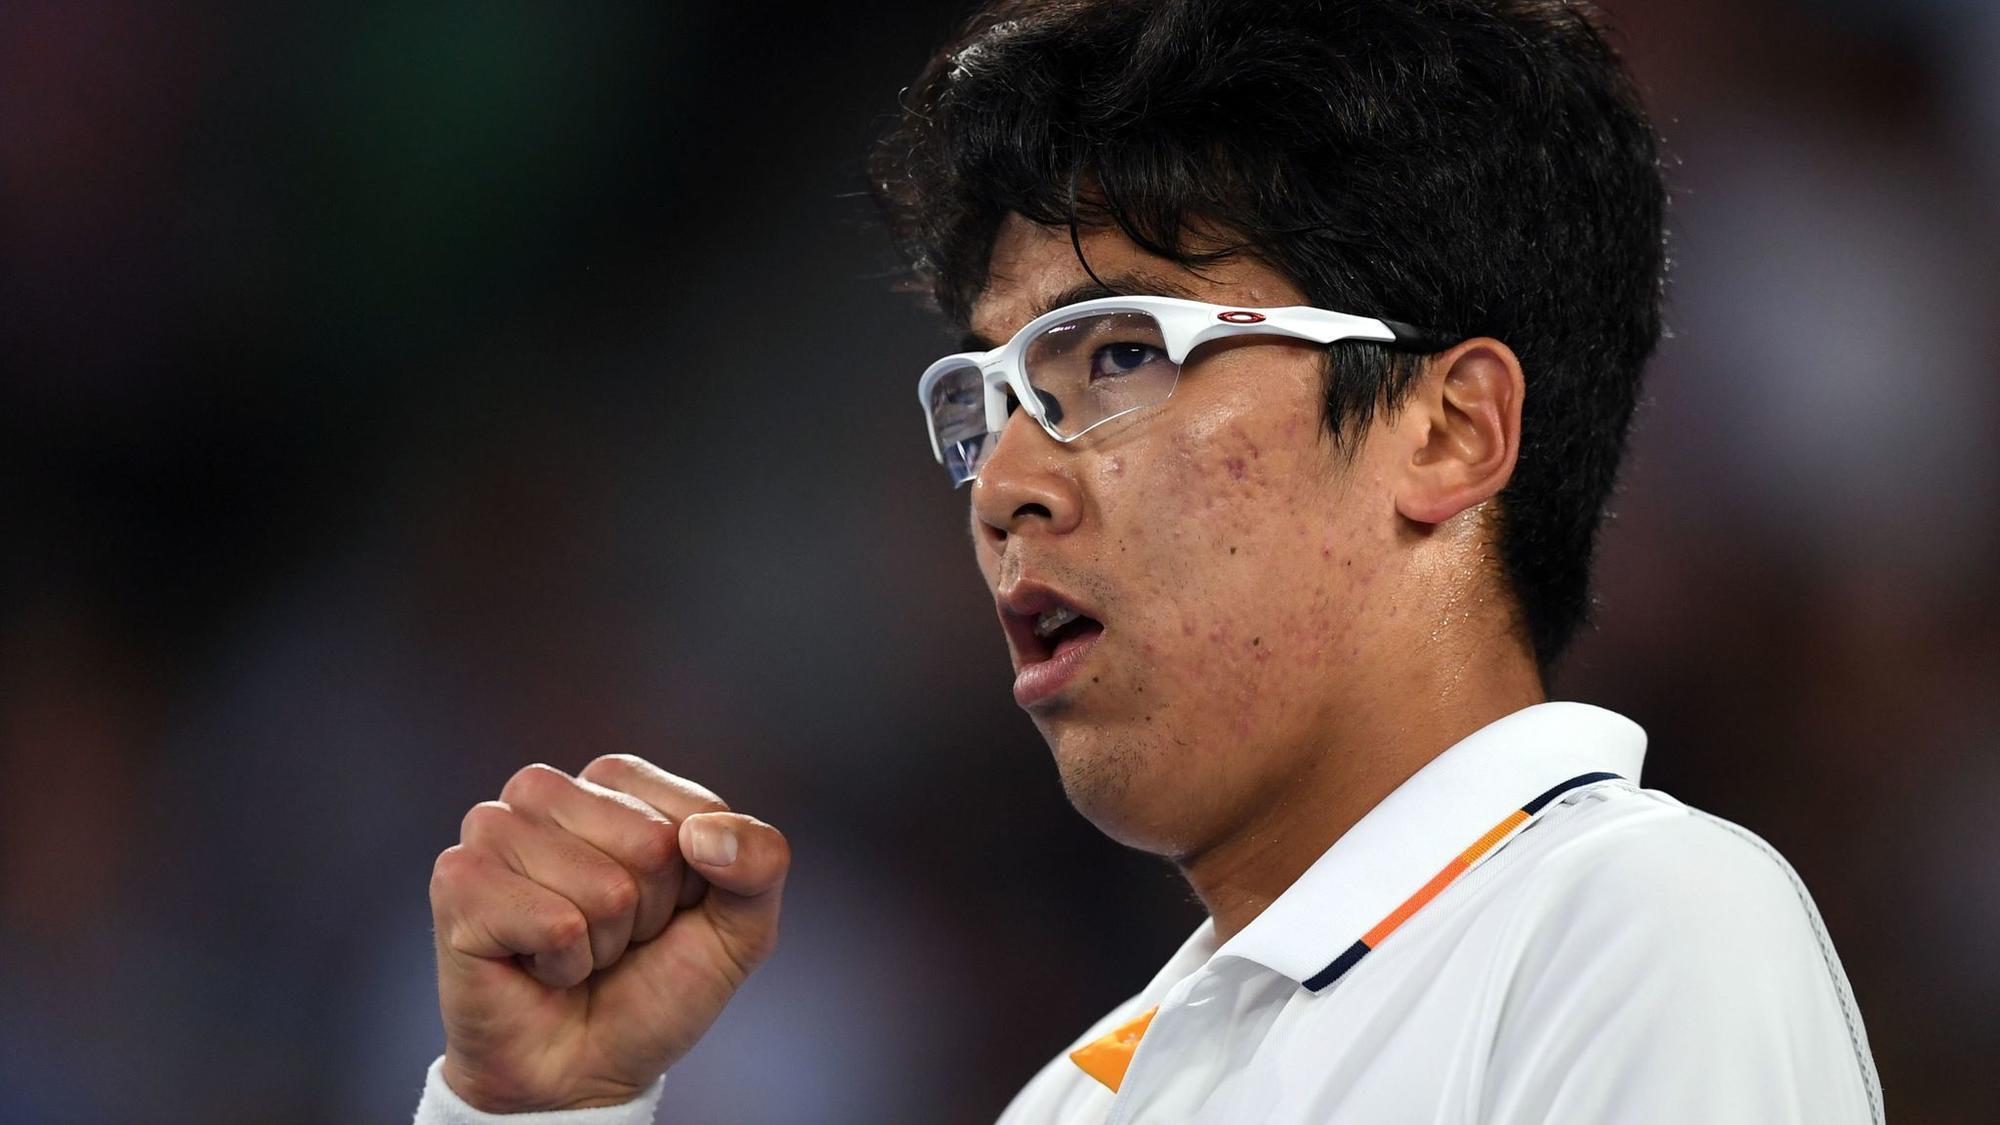 Australian Open: Novak Djokovic ousted; American Tennys Sandgren topples No. 5 Dominic Thiem